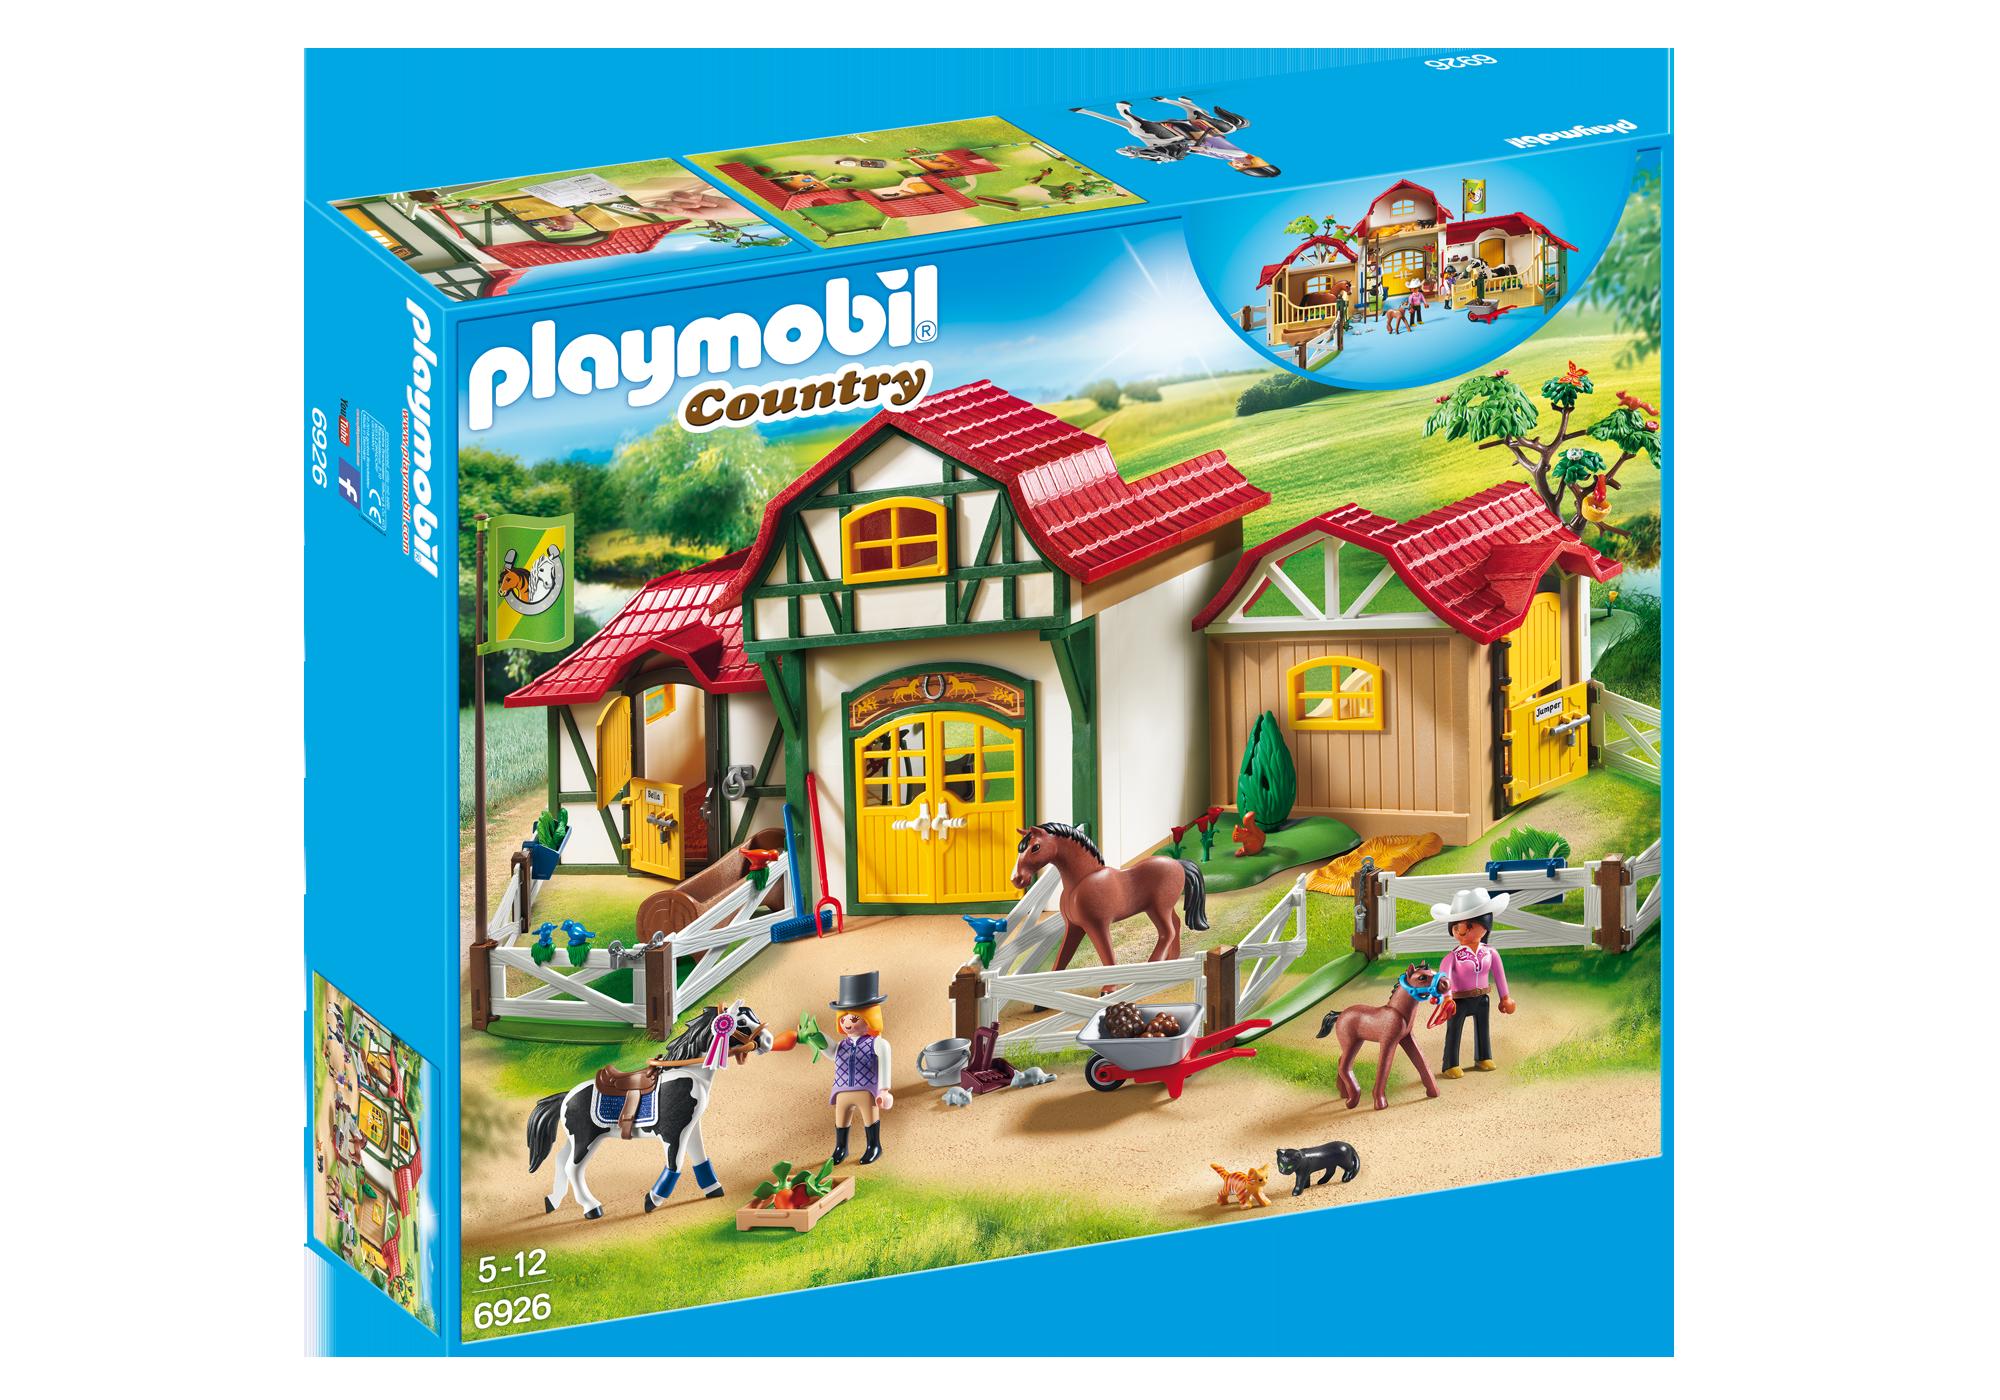 http://media.playmobil.com/i/playmobil/6926_product_box_front/Μεγάλος Ιππικός Όμιλος